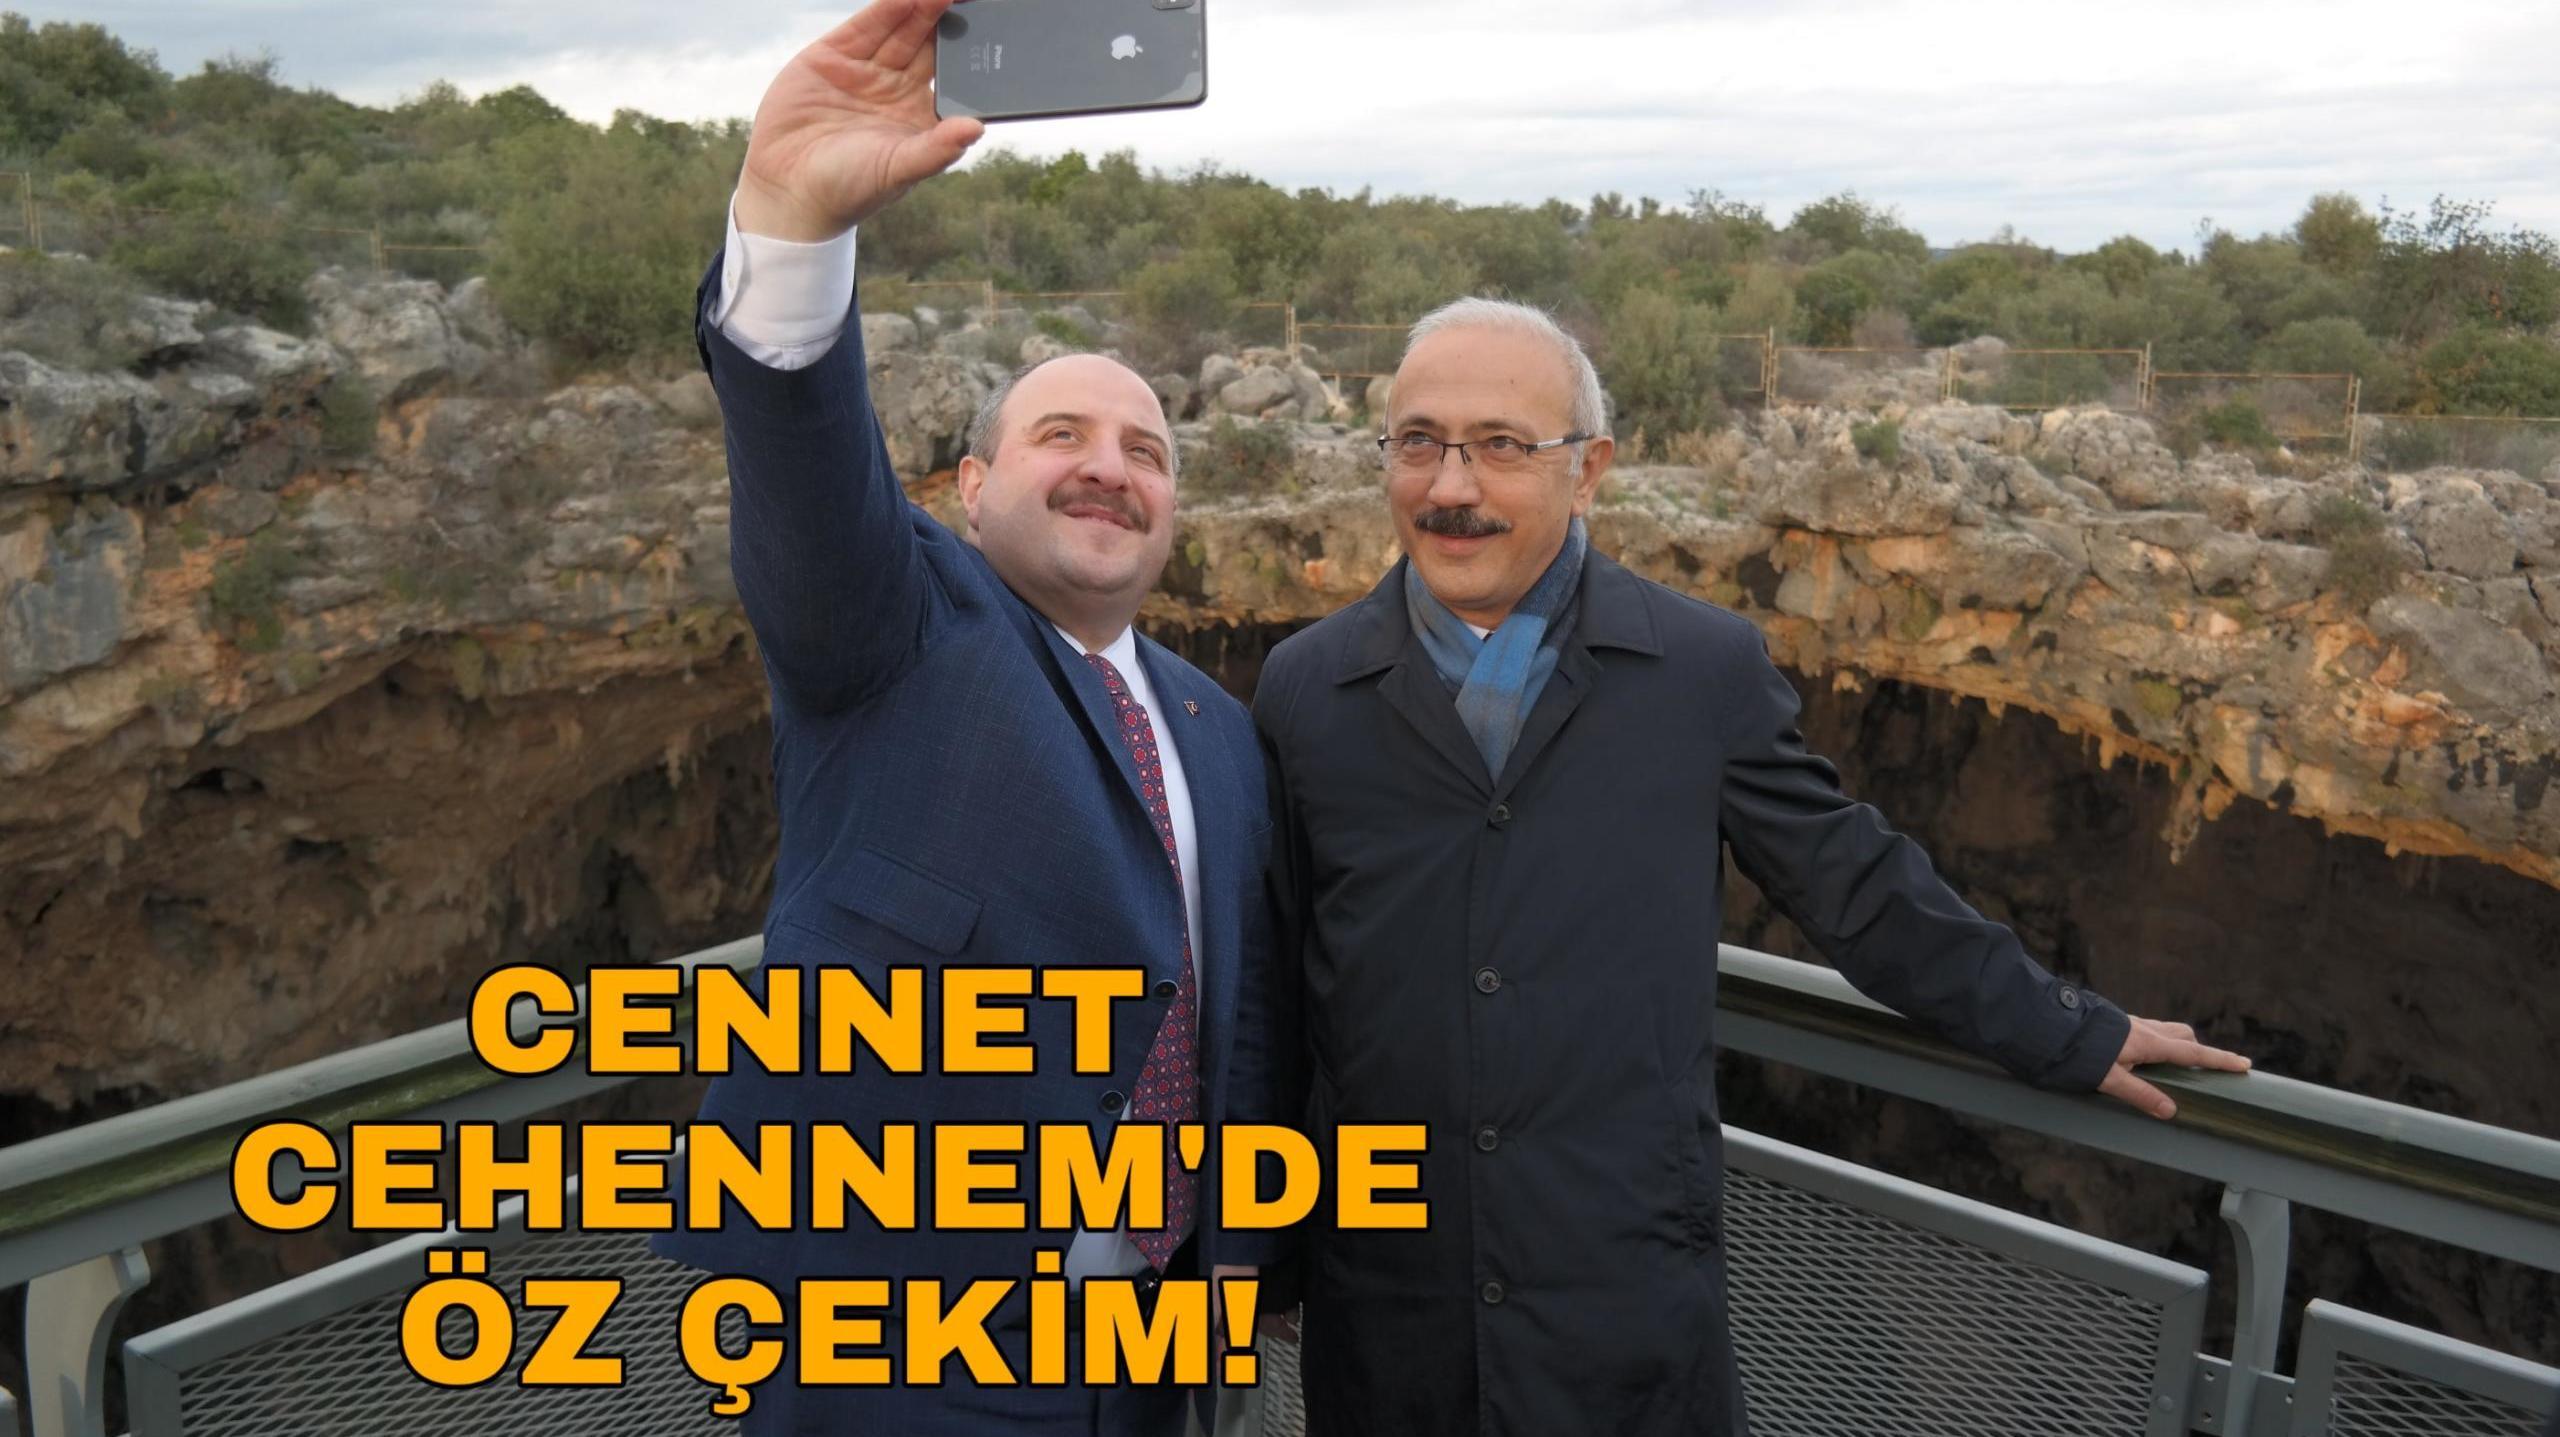 Bakan, Cennet Cehennem'de!